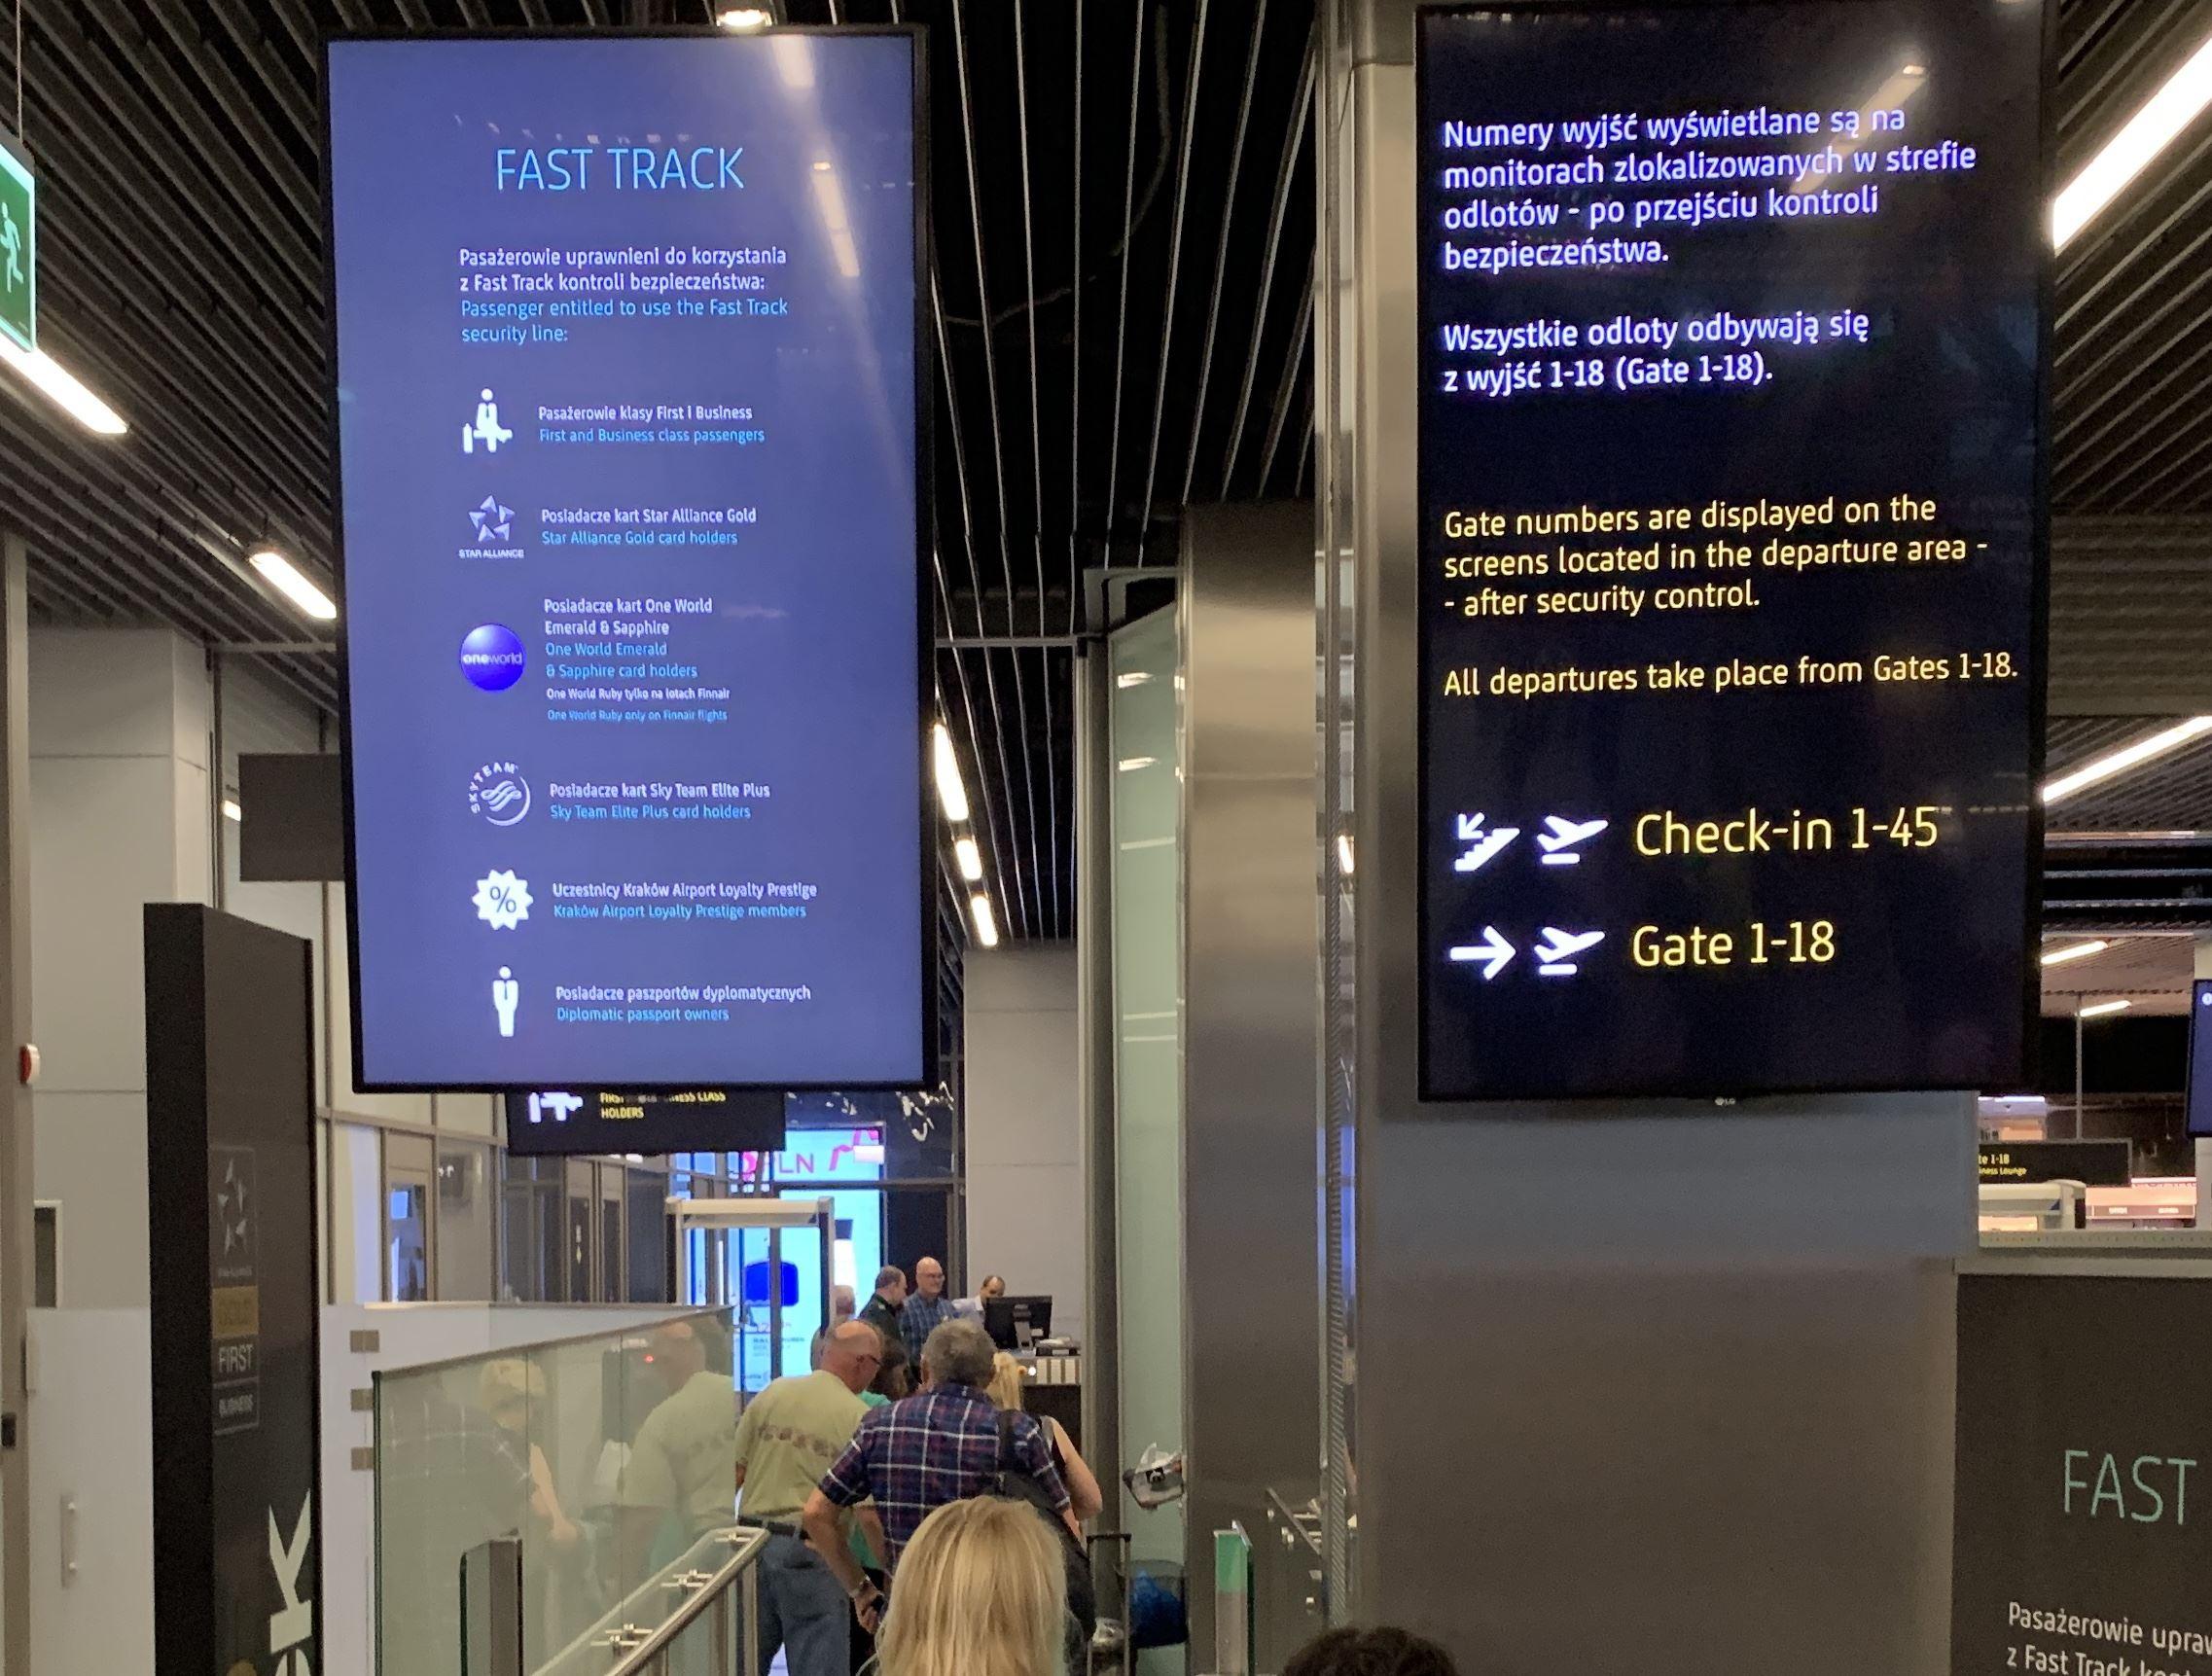 Krakow Airport Fast Track